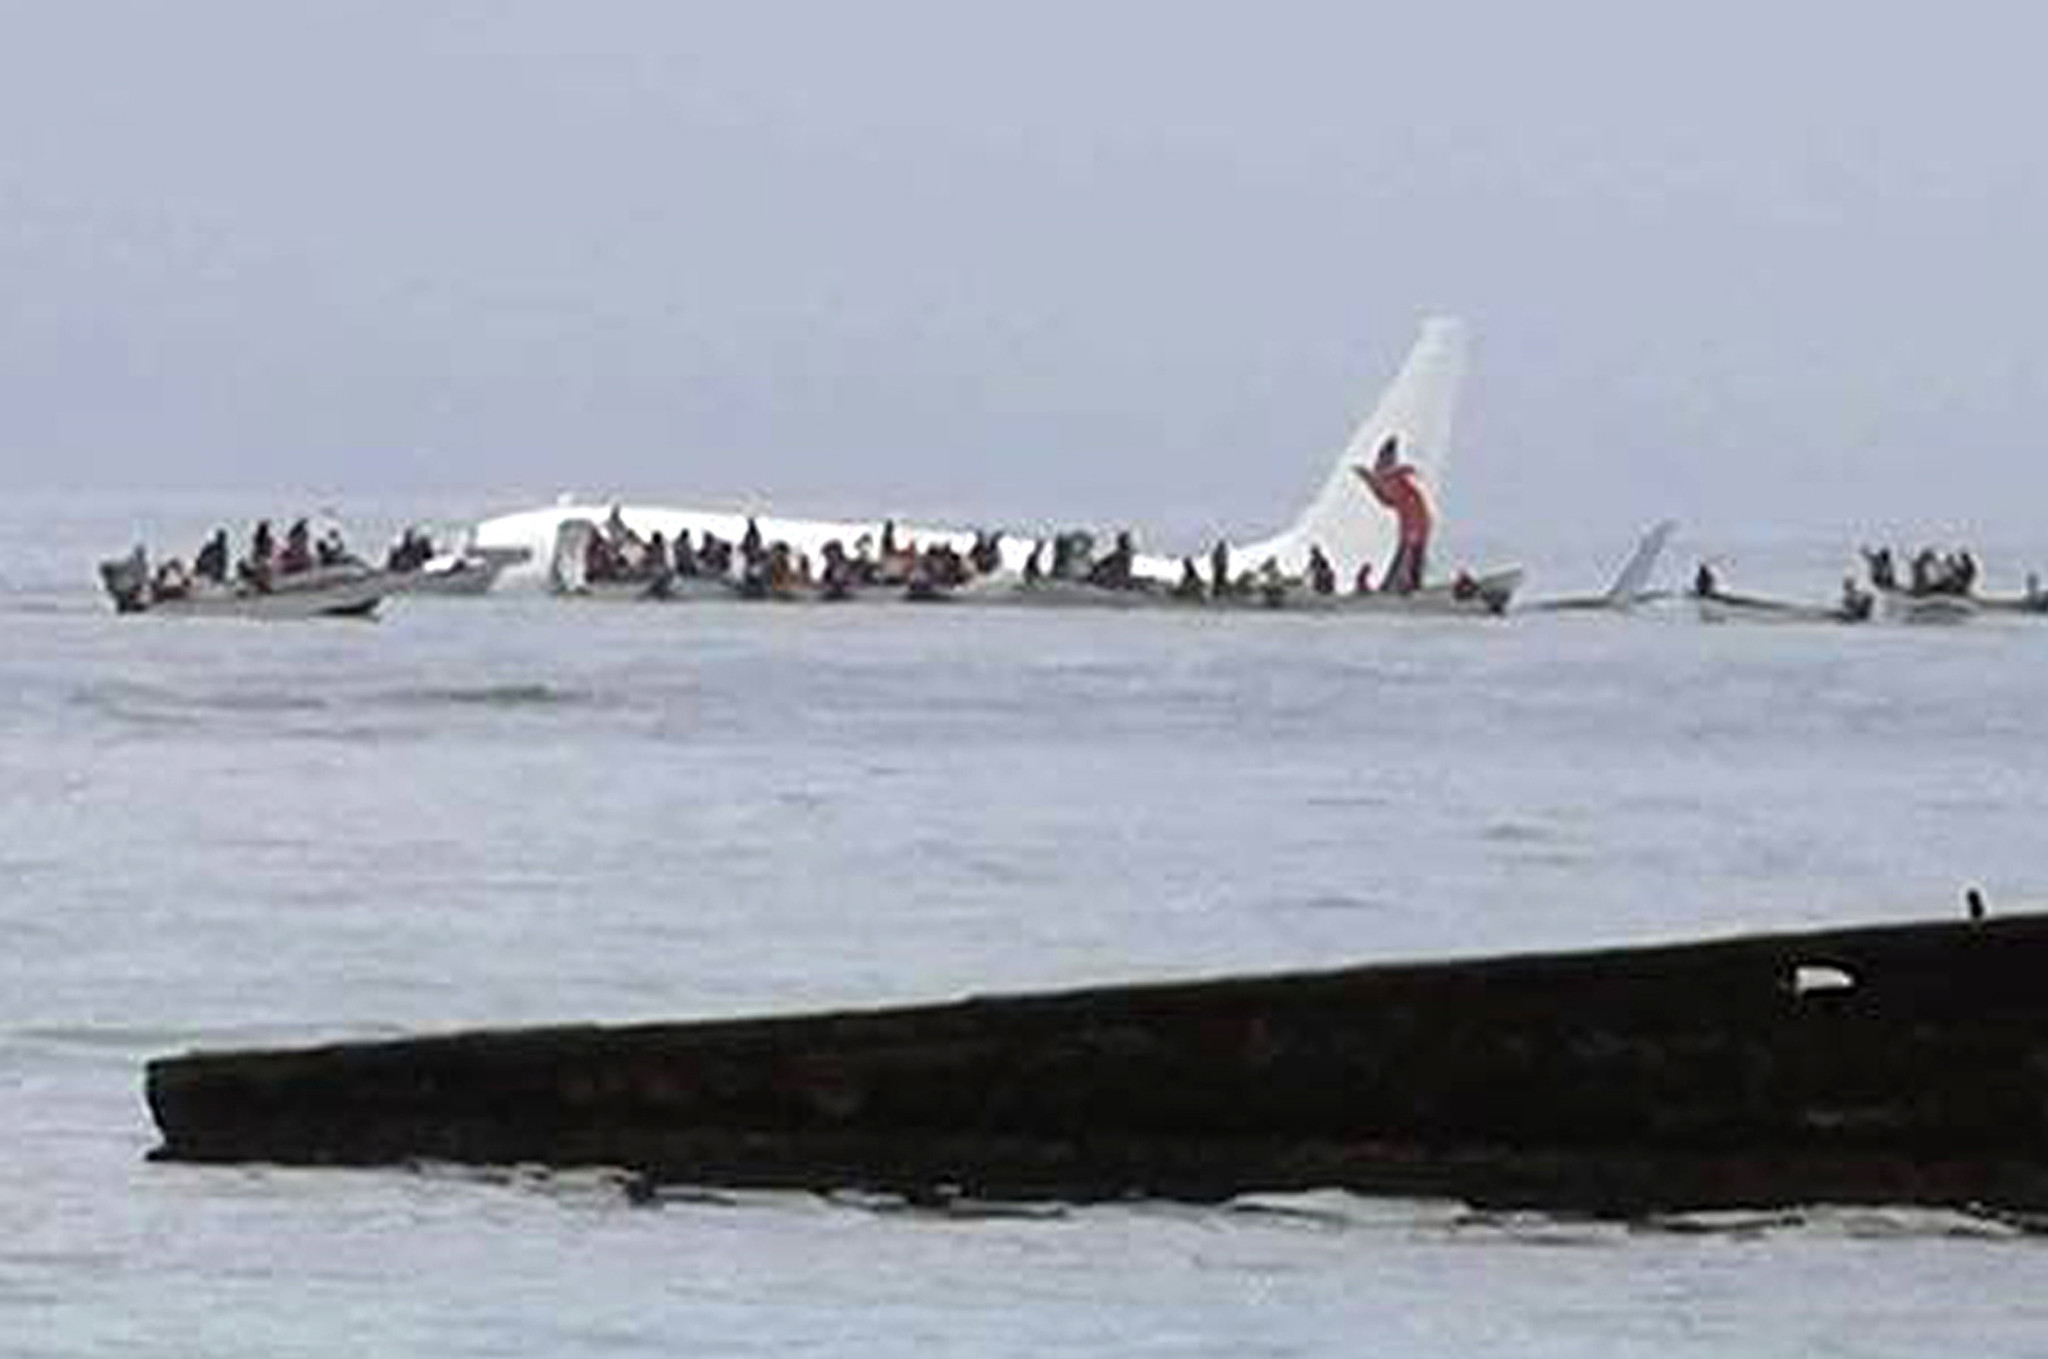 [Image: os-ap-everybody-on-plane-survives-crash-...n-20180928]